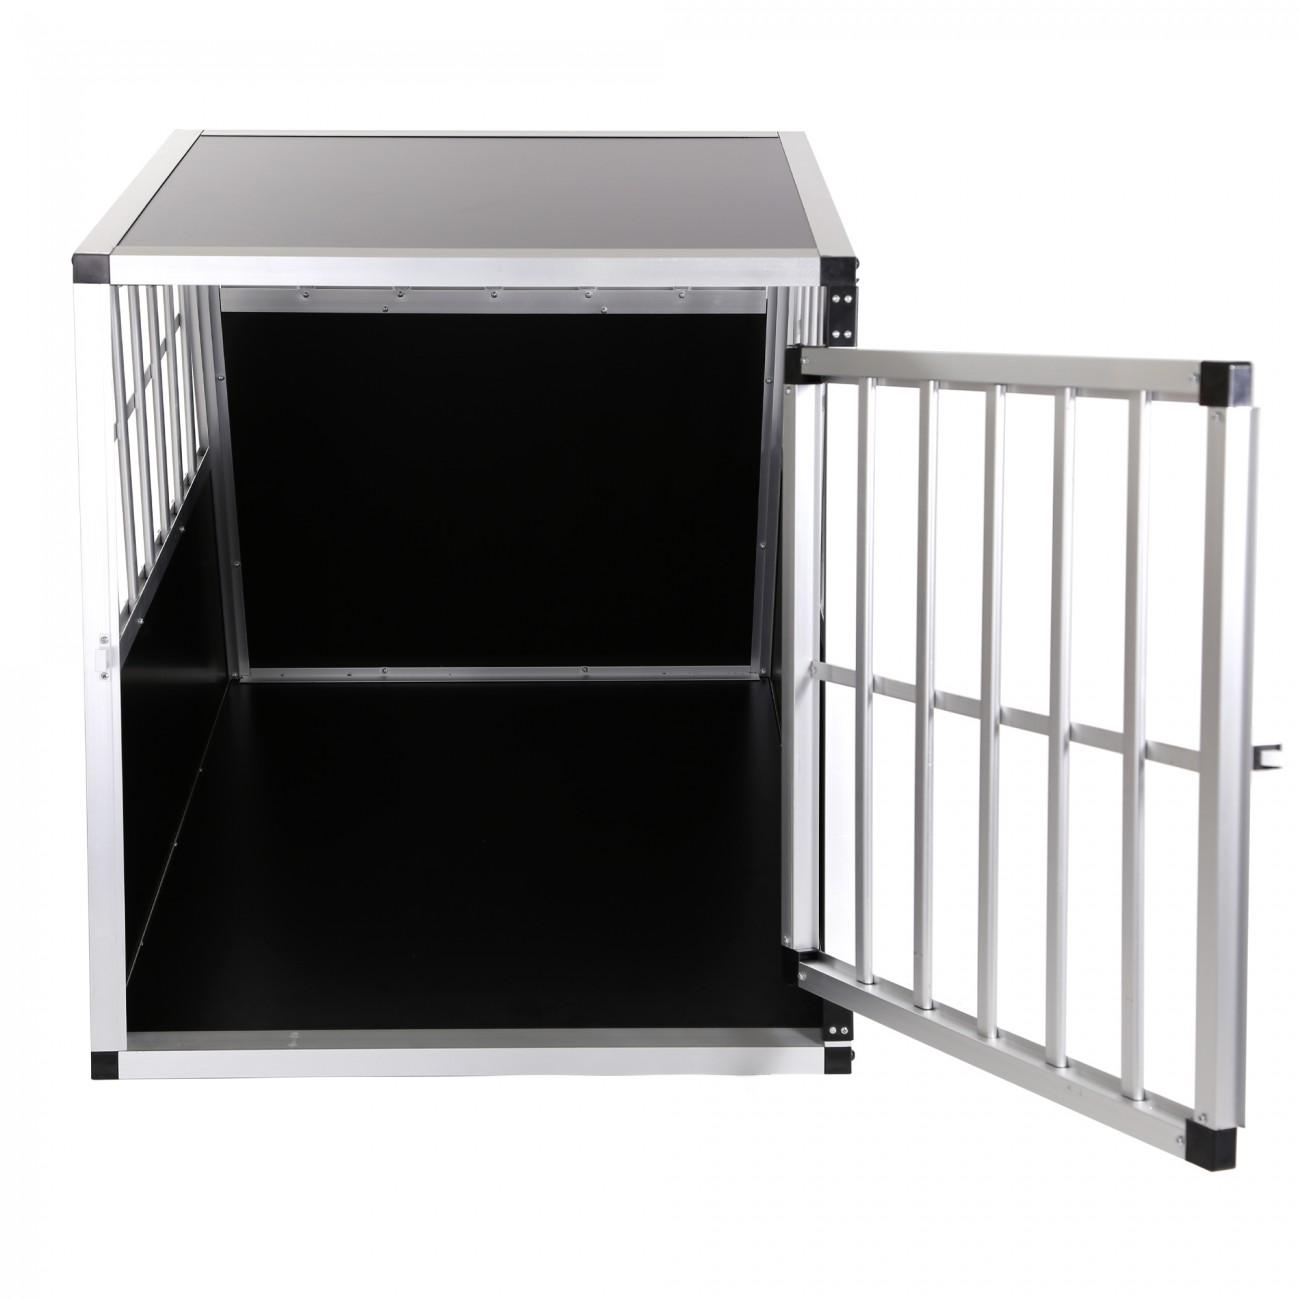 cage de transport pour chien mobile box aluminium caisse boite premium 1 porte ebay. Black Bedroom Furniture Sets. Home Design Ideas